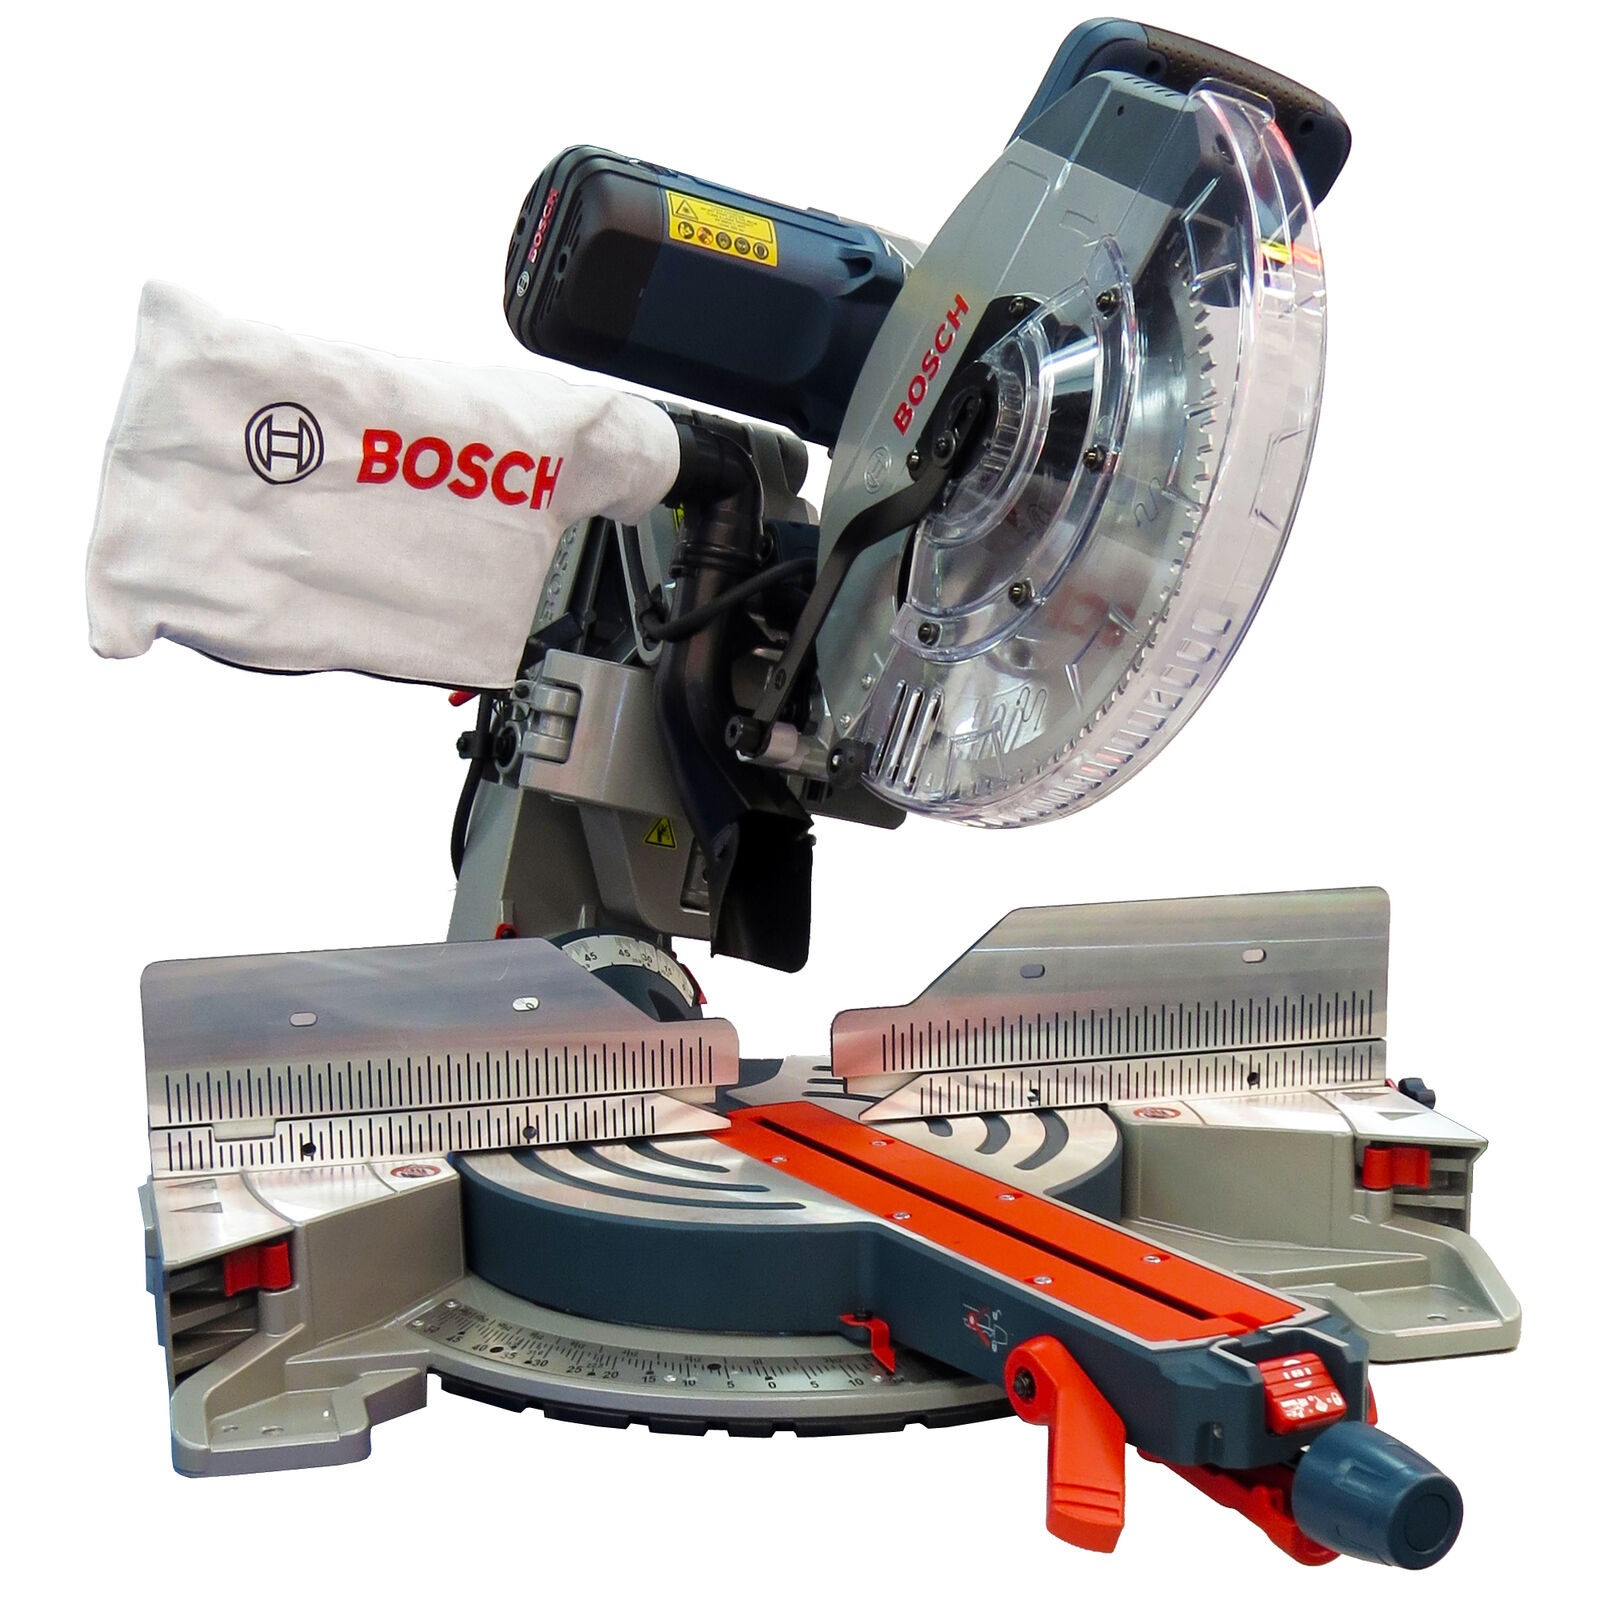 Bosch Kapp- und Gehrungssäge GCM 12 GDL Professional im Set - Kappsäge